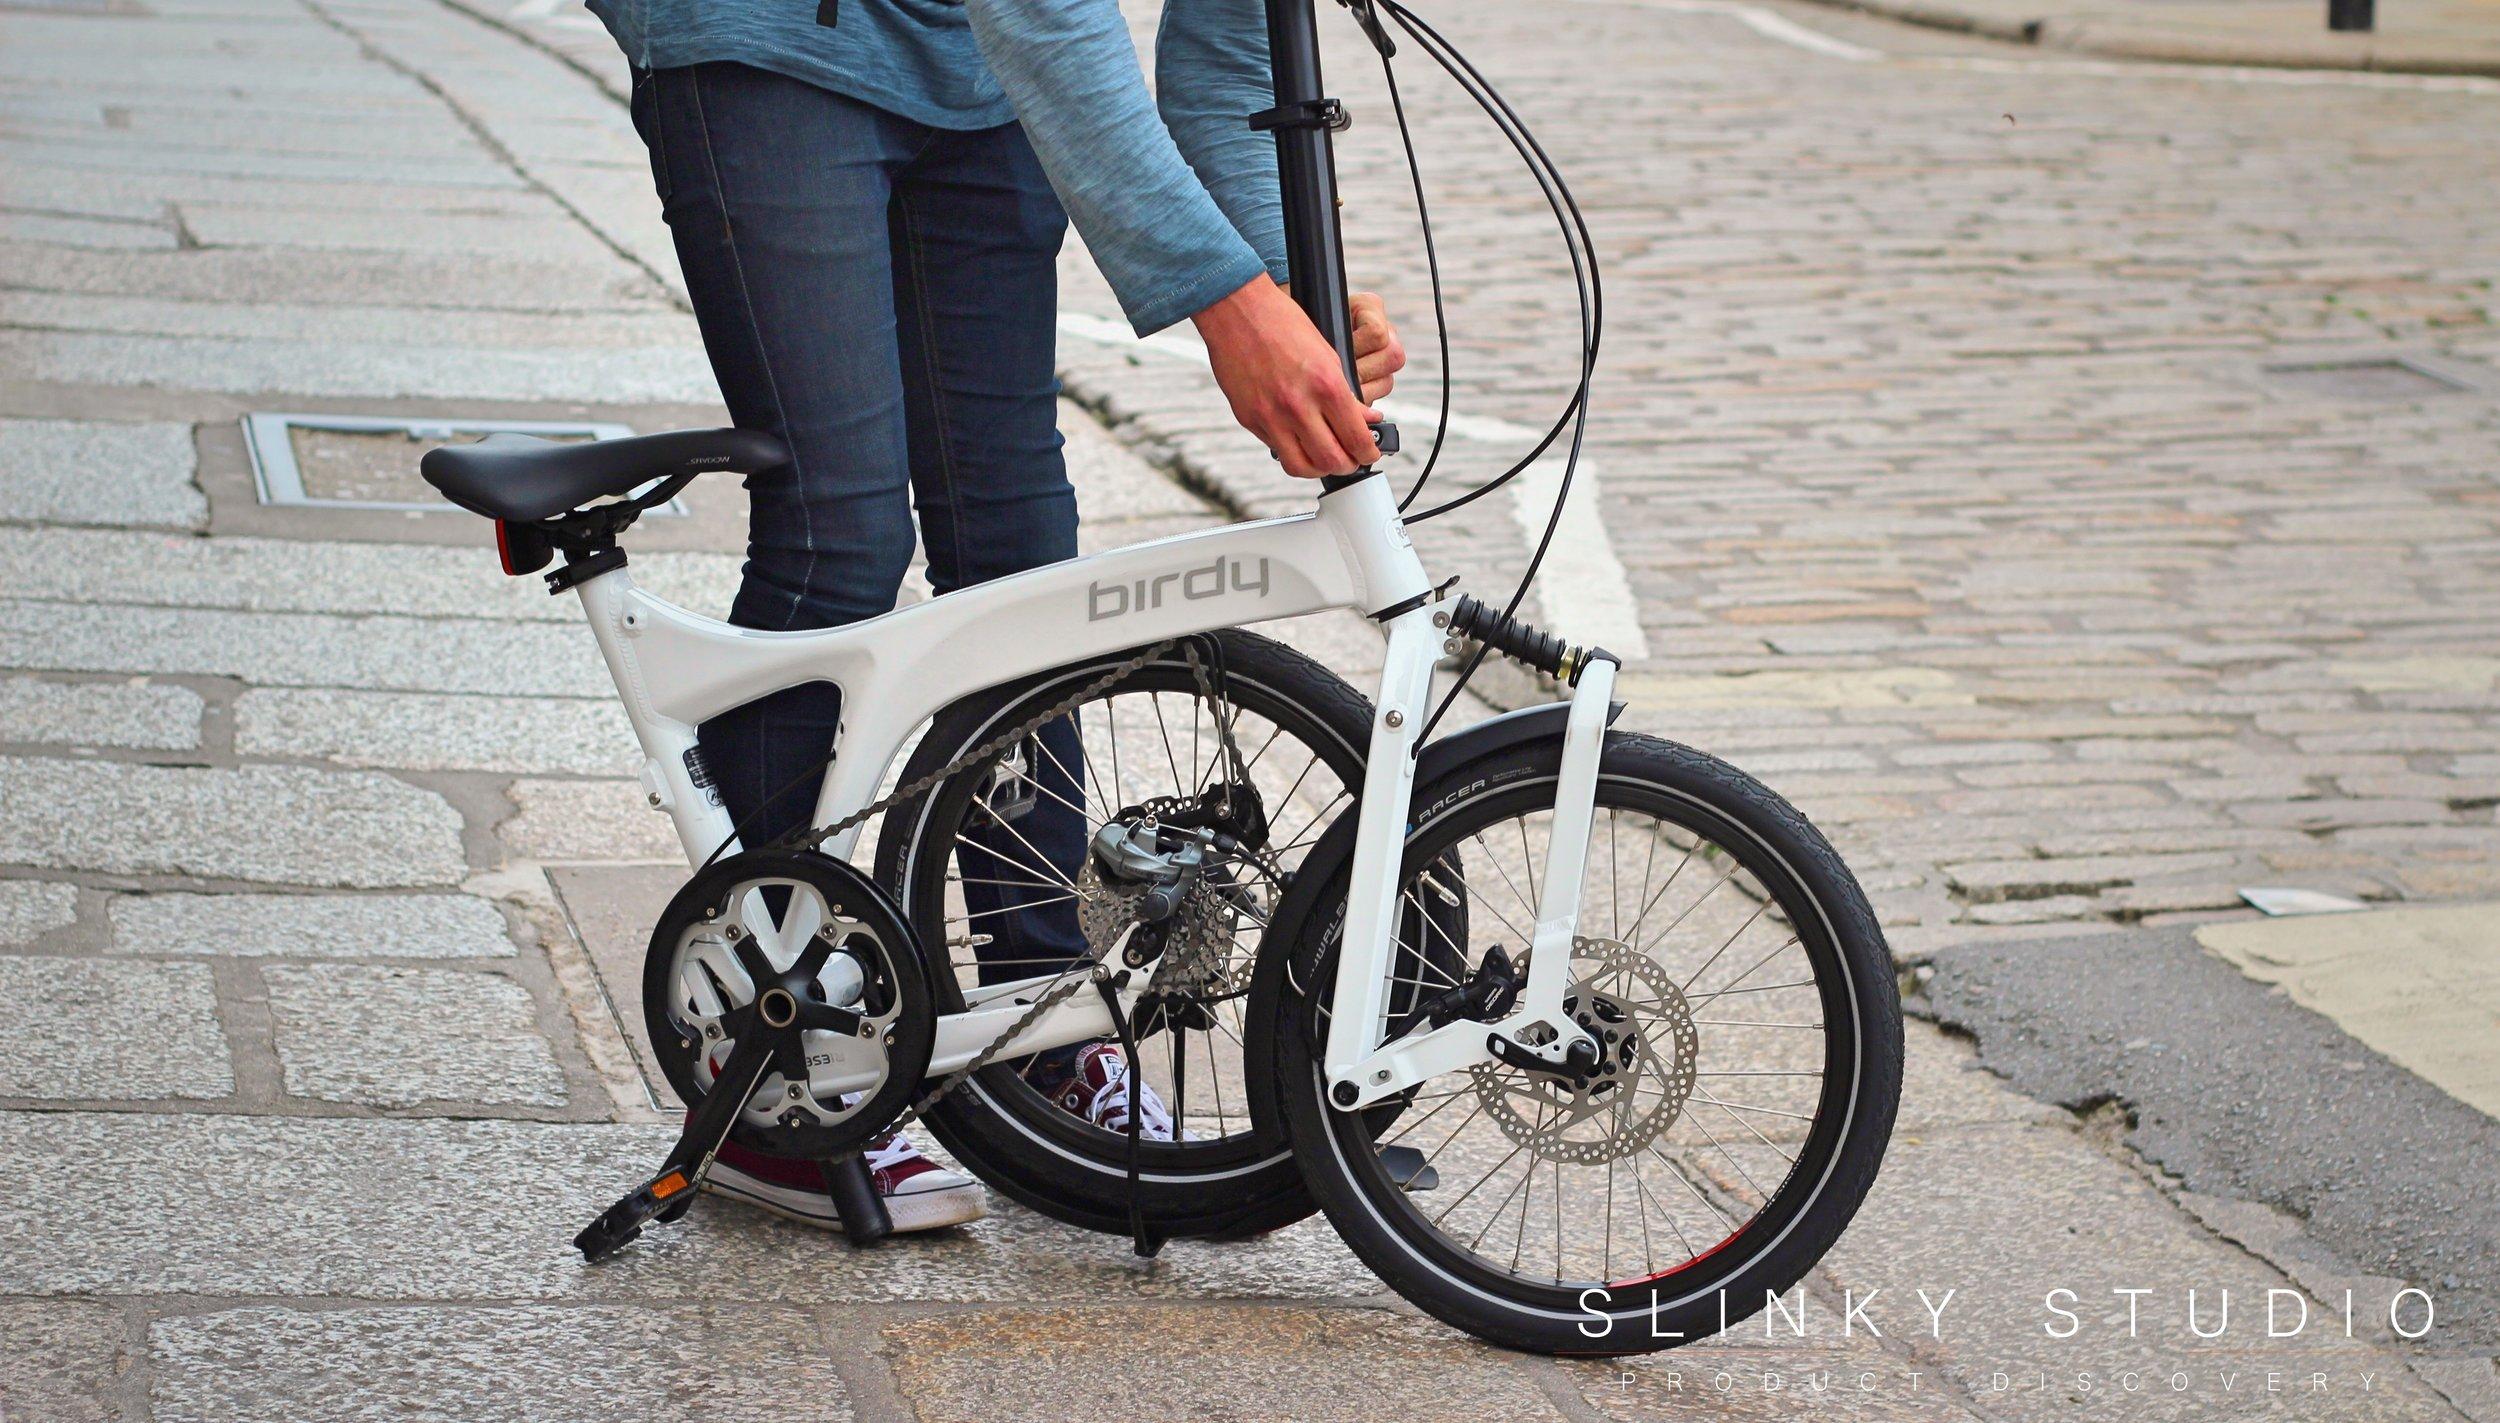 Birdy Speed Folding Bike Securing Handlebars.jpg